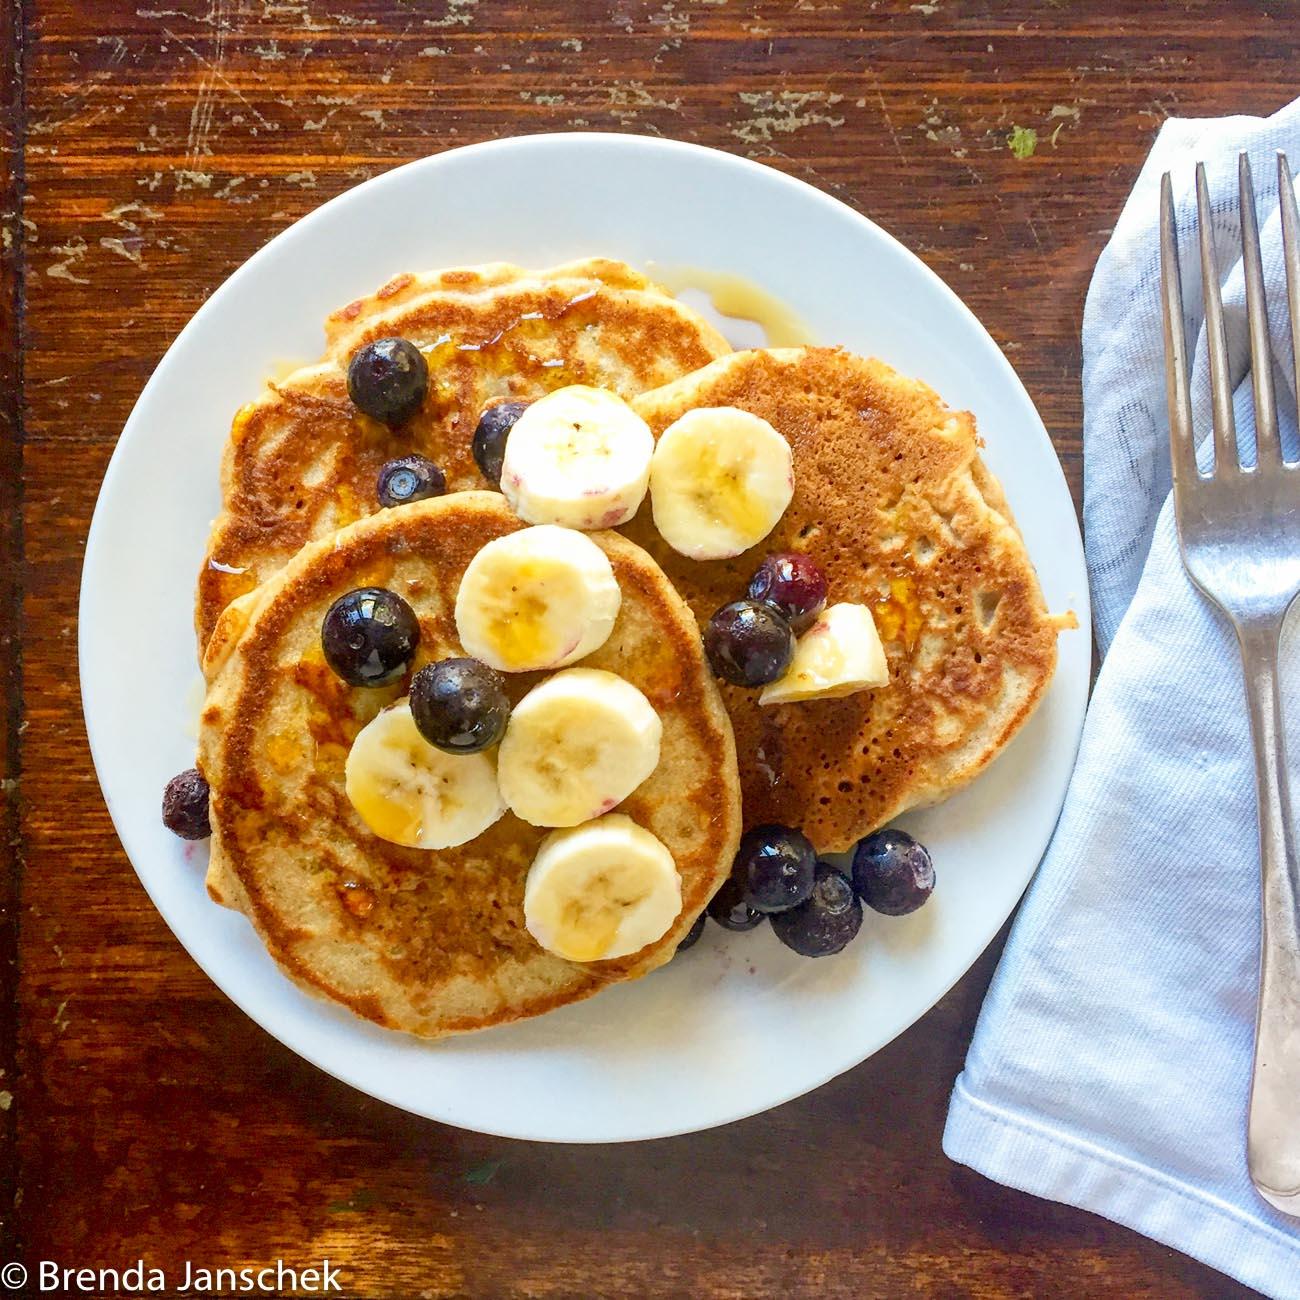 Brenda-Janschek-Recipe-Pancakes-Toppings-TFeature.jpg